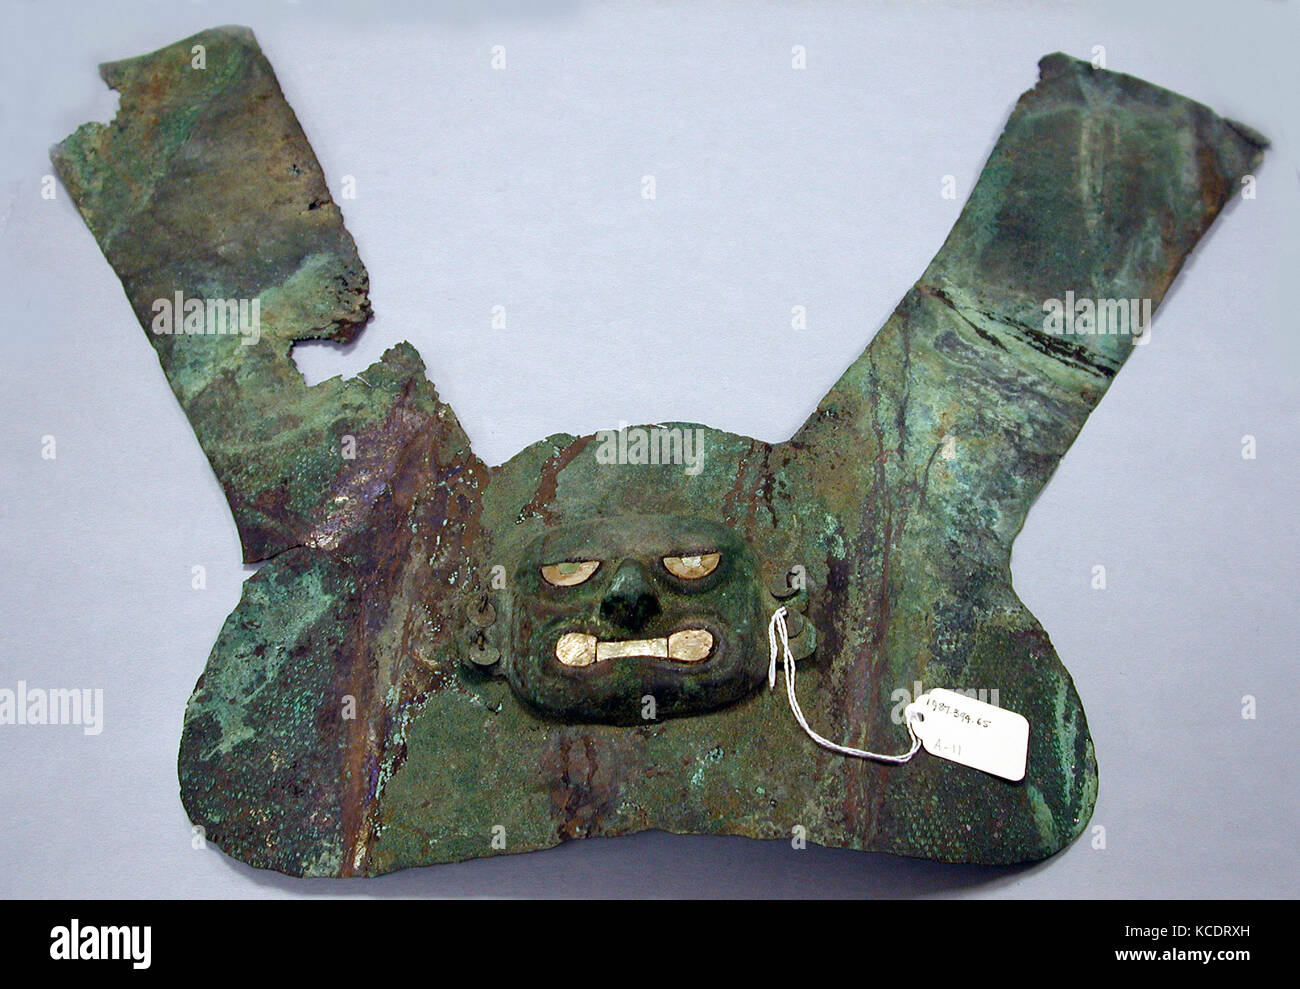 Headdress Ornament, 390–450, Peru, Moche (Loma Negra), Silvered copper, shell, turquoise, H x W: 18 1/2 x 23 1/4in. - Stock Image